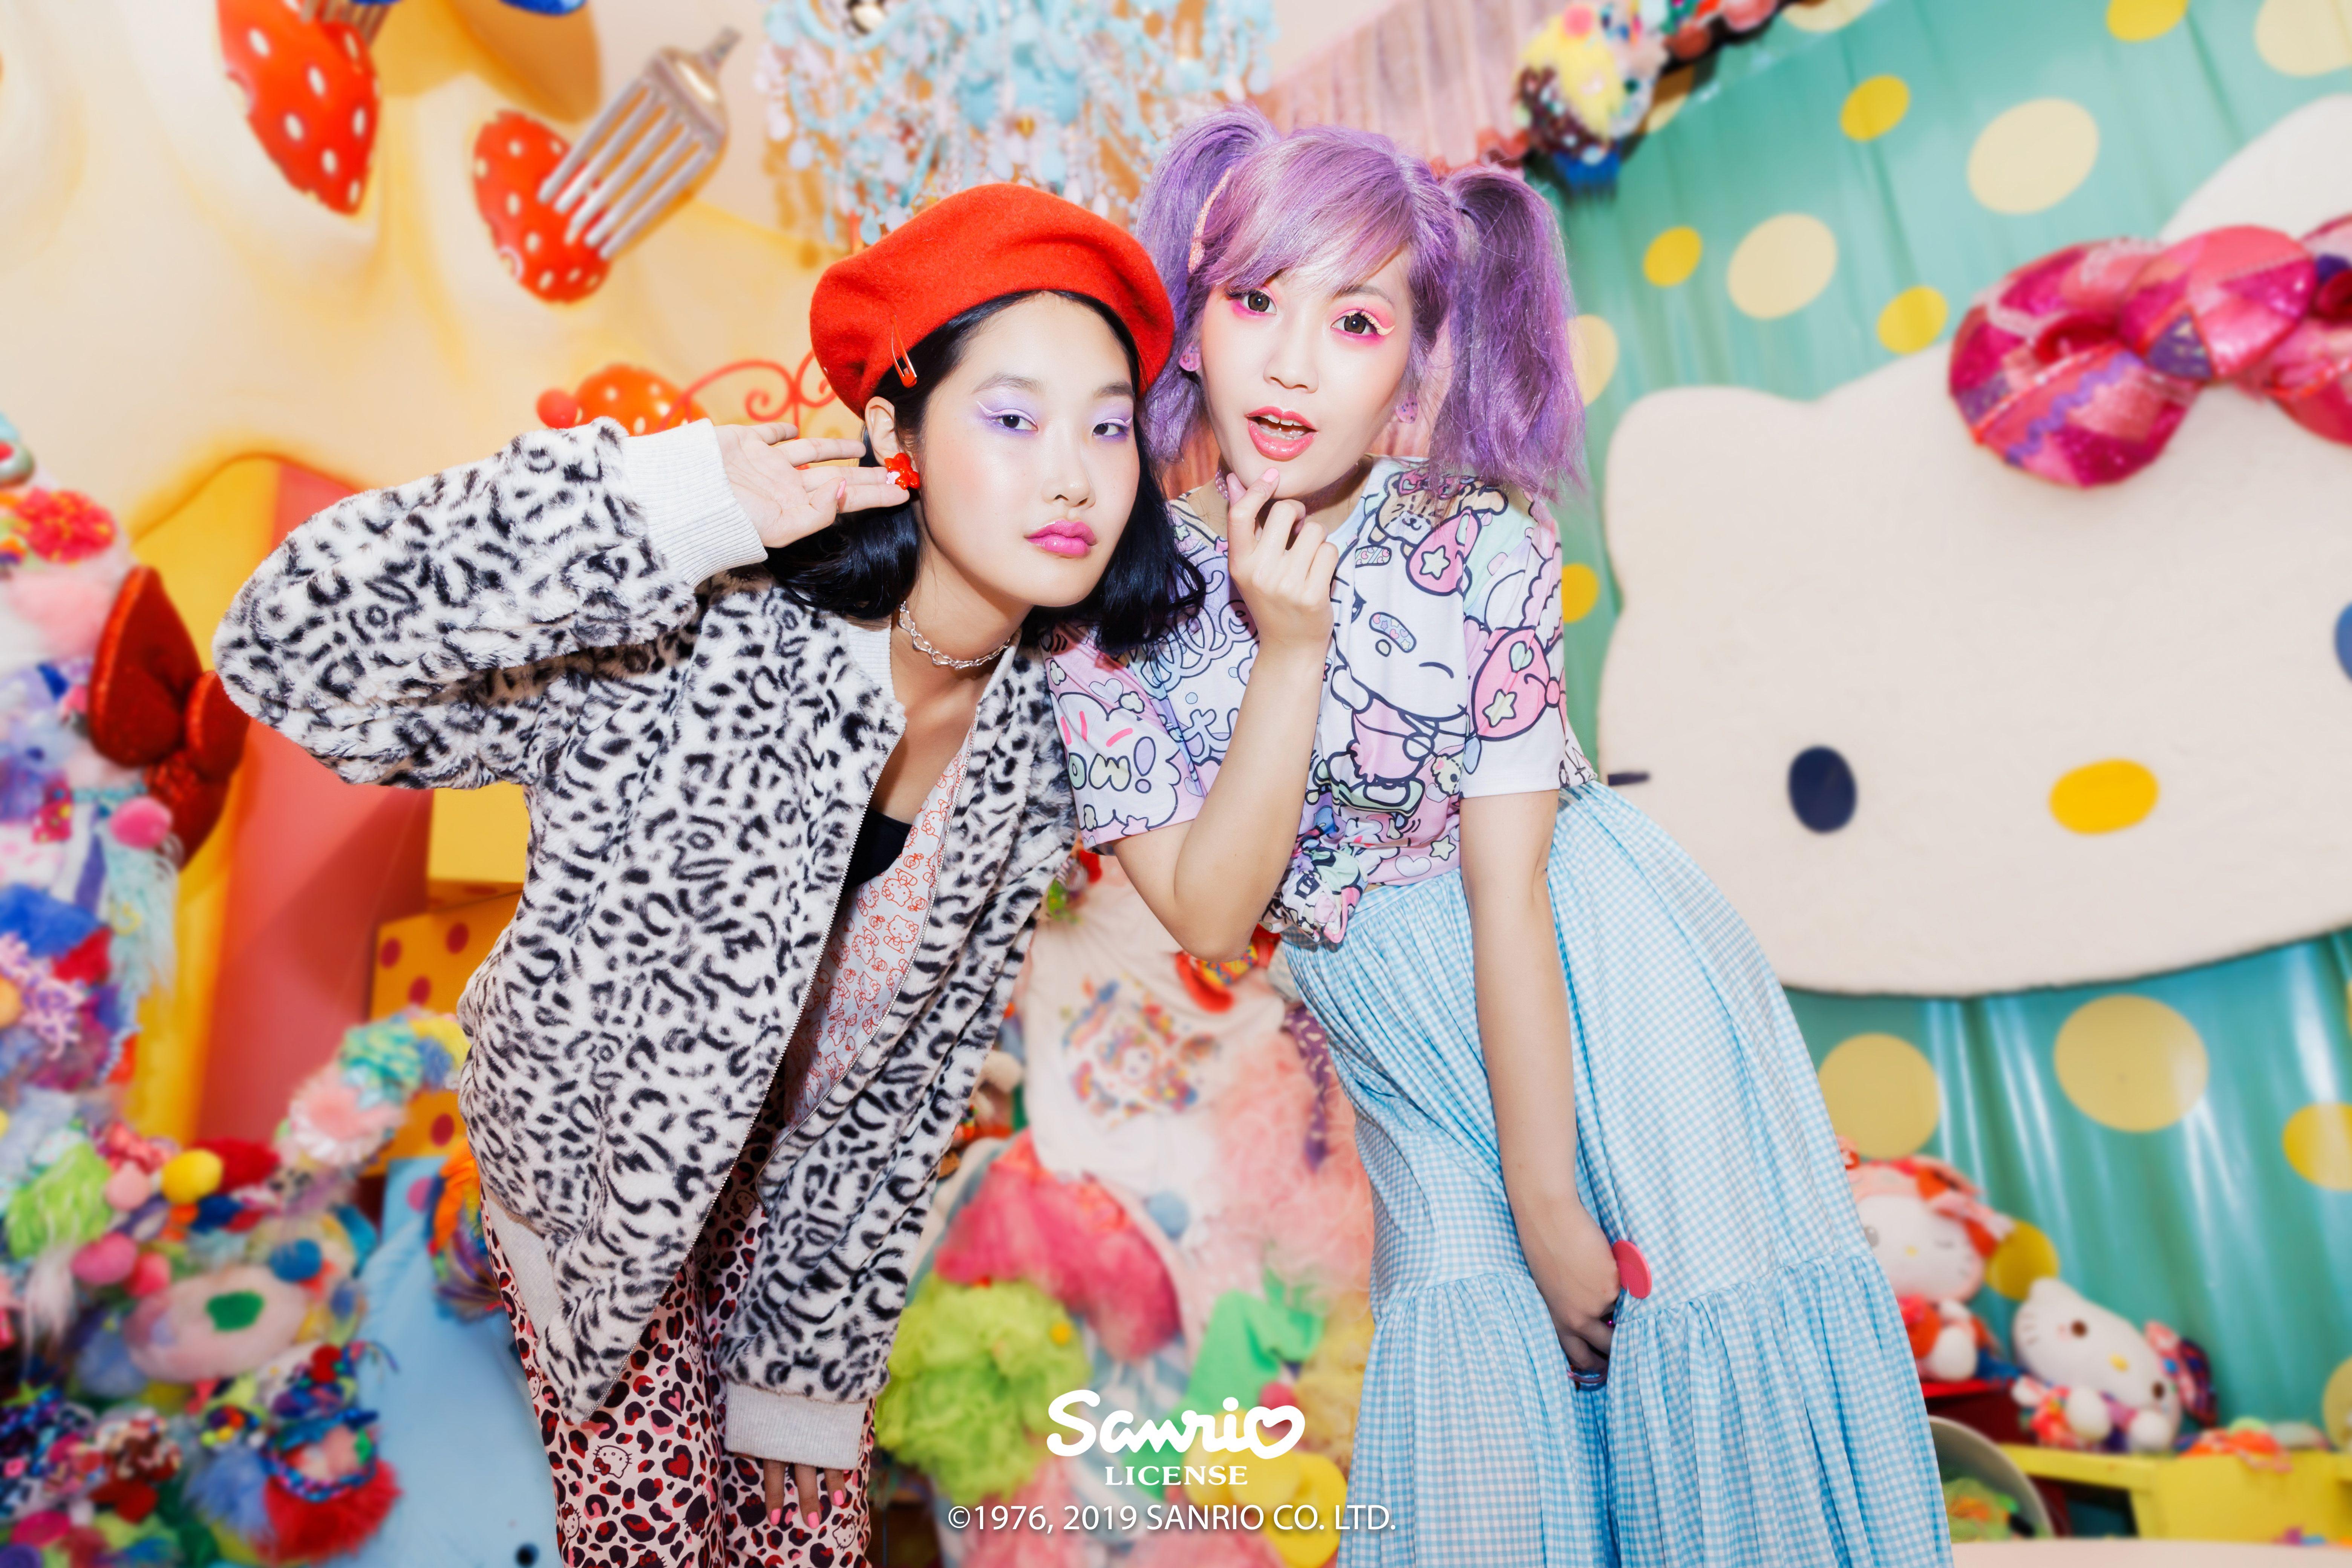 Hello Kitty Friends Furever Bomber Jacket 139aud Hello Kitty Lover Cuffed Pants 119aud Hello Kitty Harajuku Bft Black Milk Clothing Black Milk Harajuku [ 4160 x 6240 Pixel ]